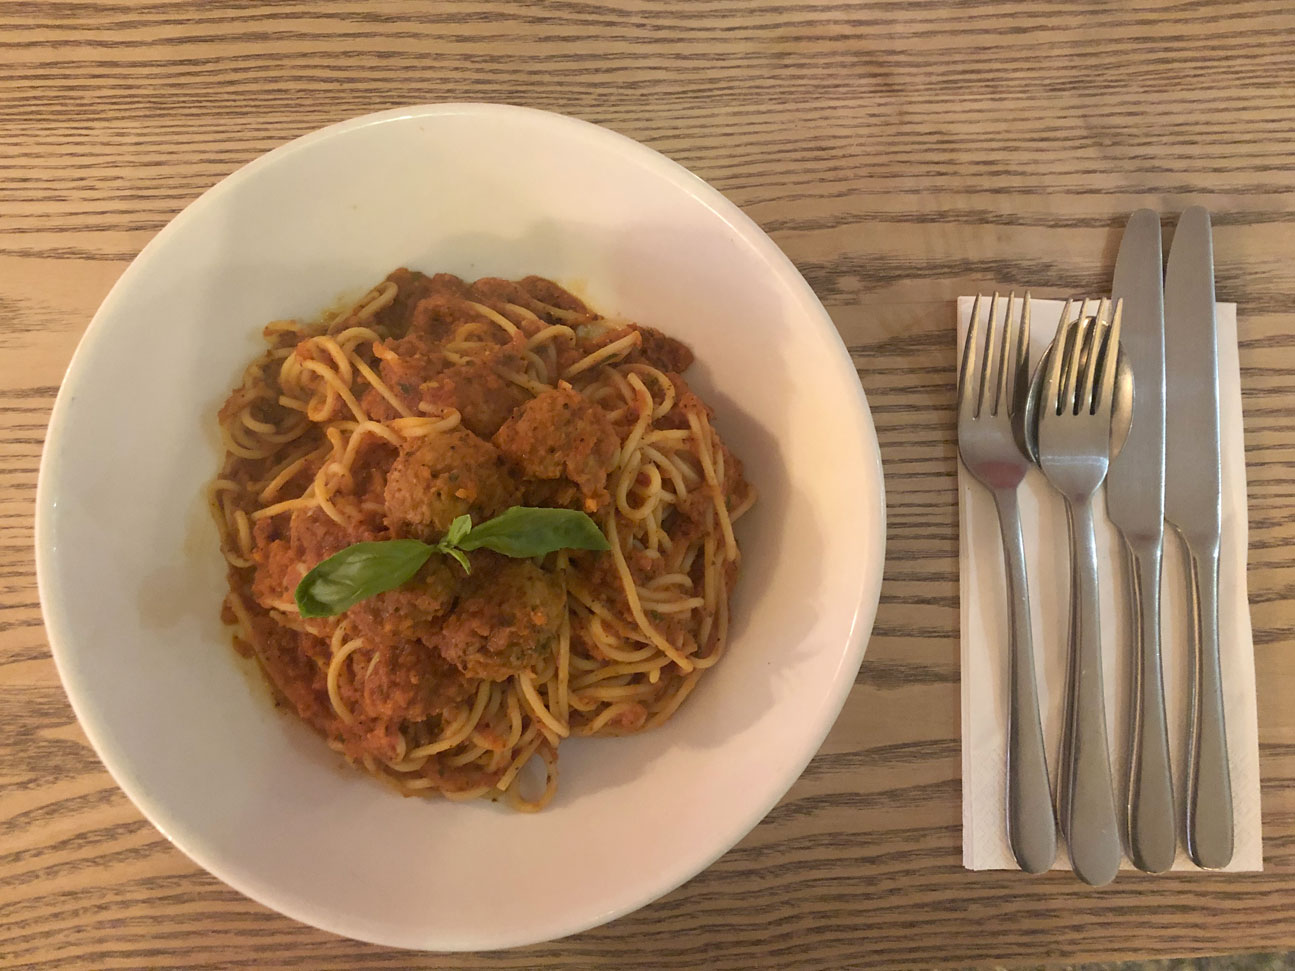 Meatballs & Spaghetti at Gios | Pizza + Pasta Crewe | Gios Crewe | Cheshire